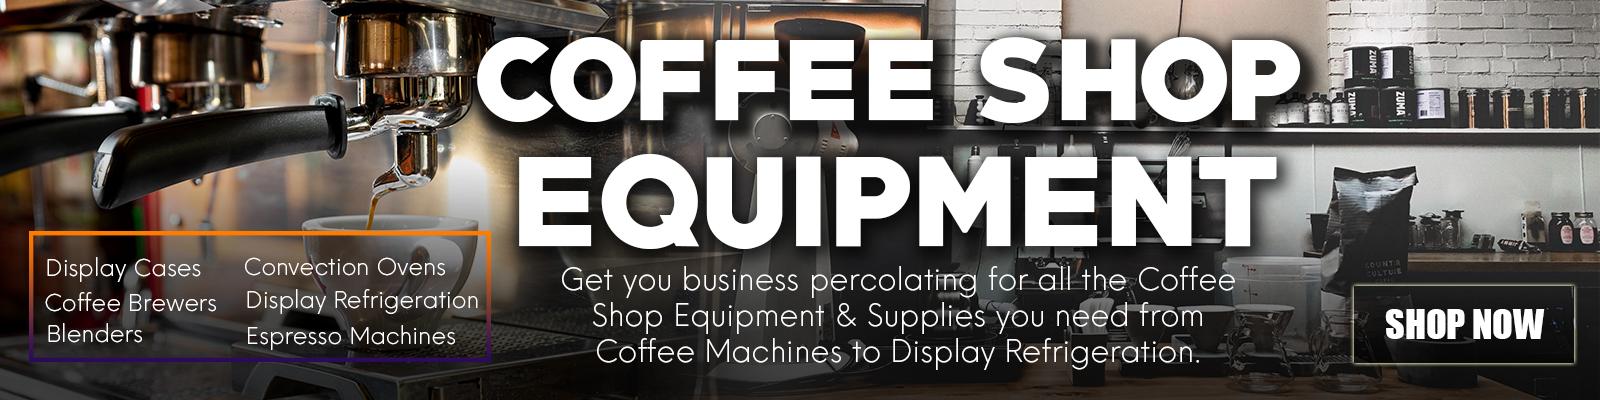 Commercial Coffee Shop Equipment, Commercial Restaurant Equipment